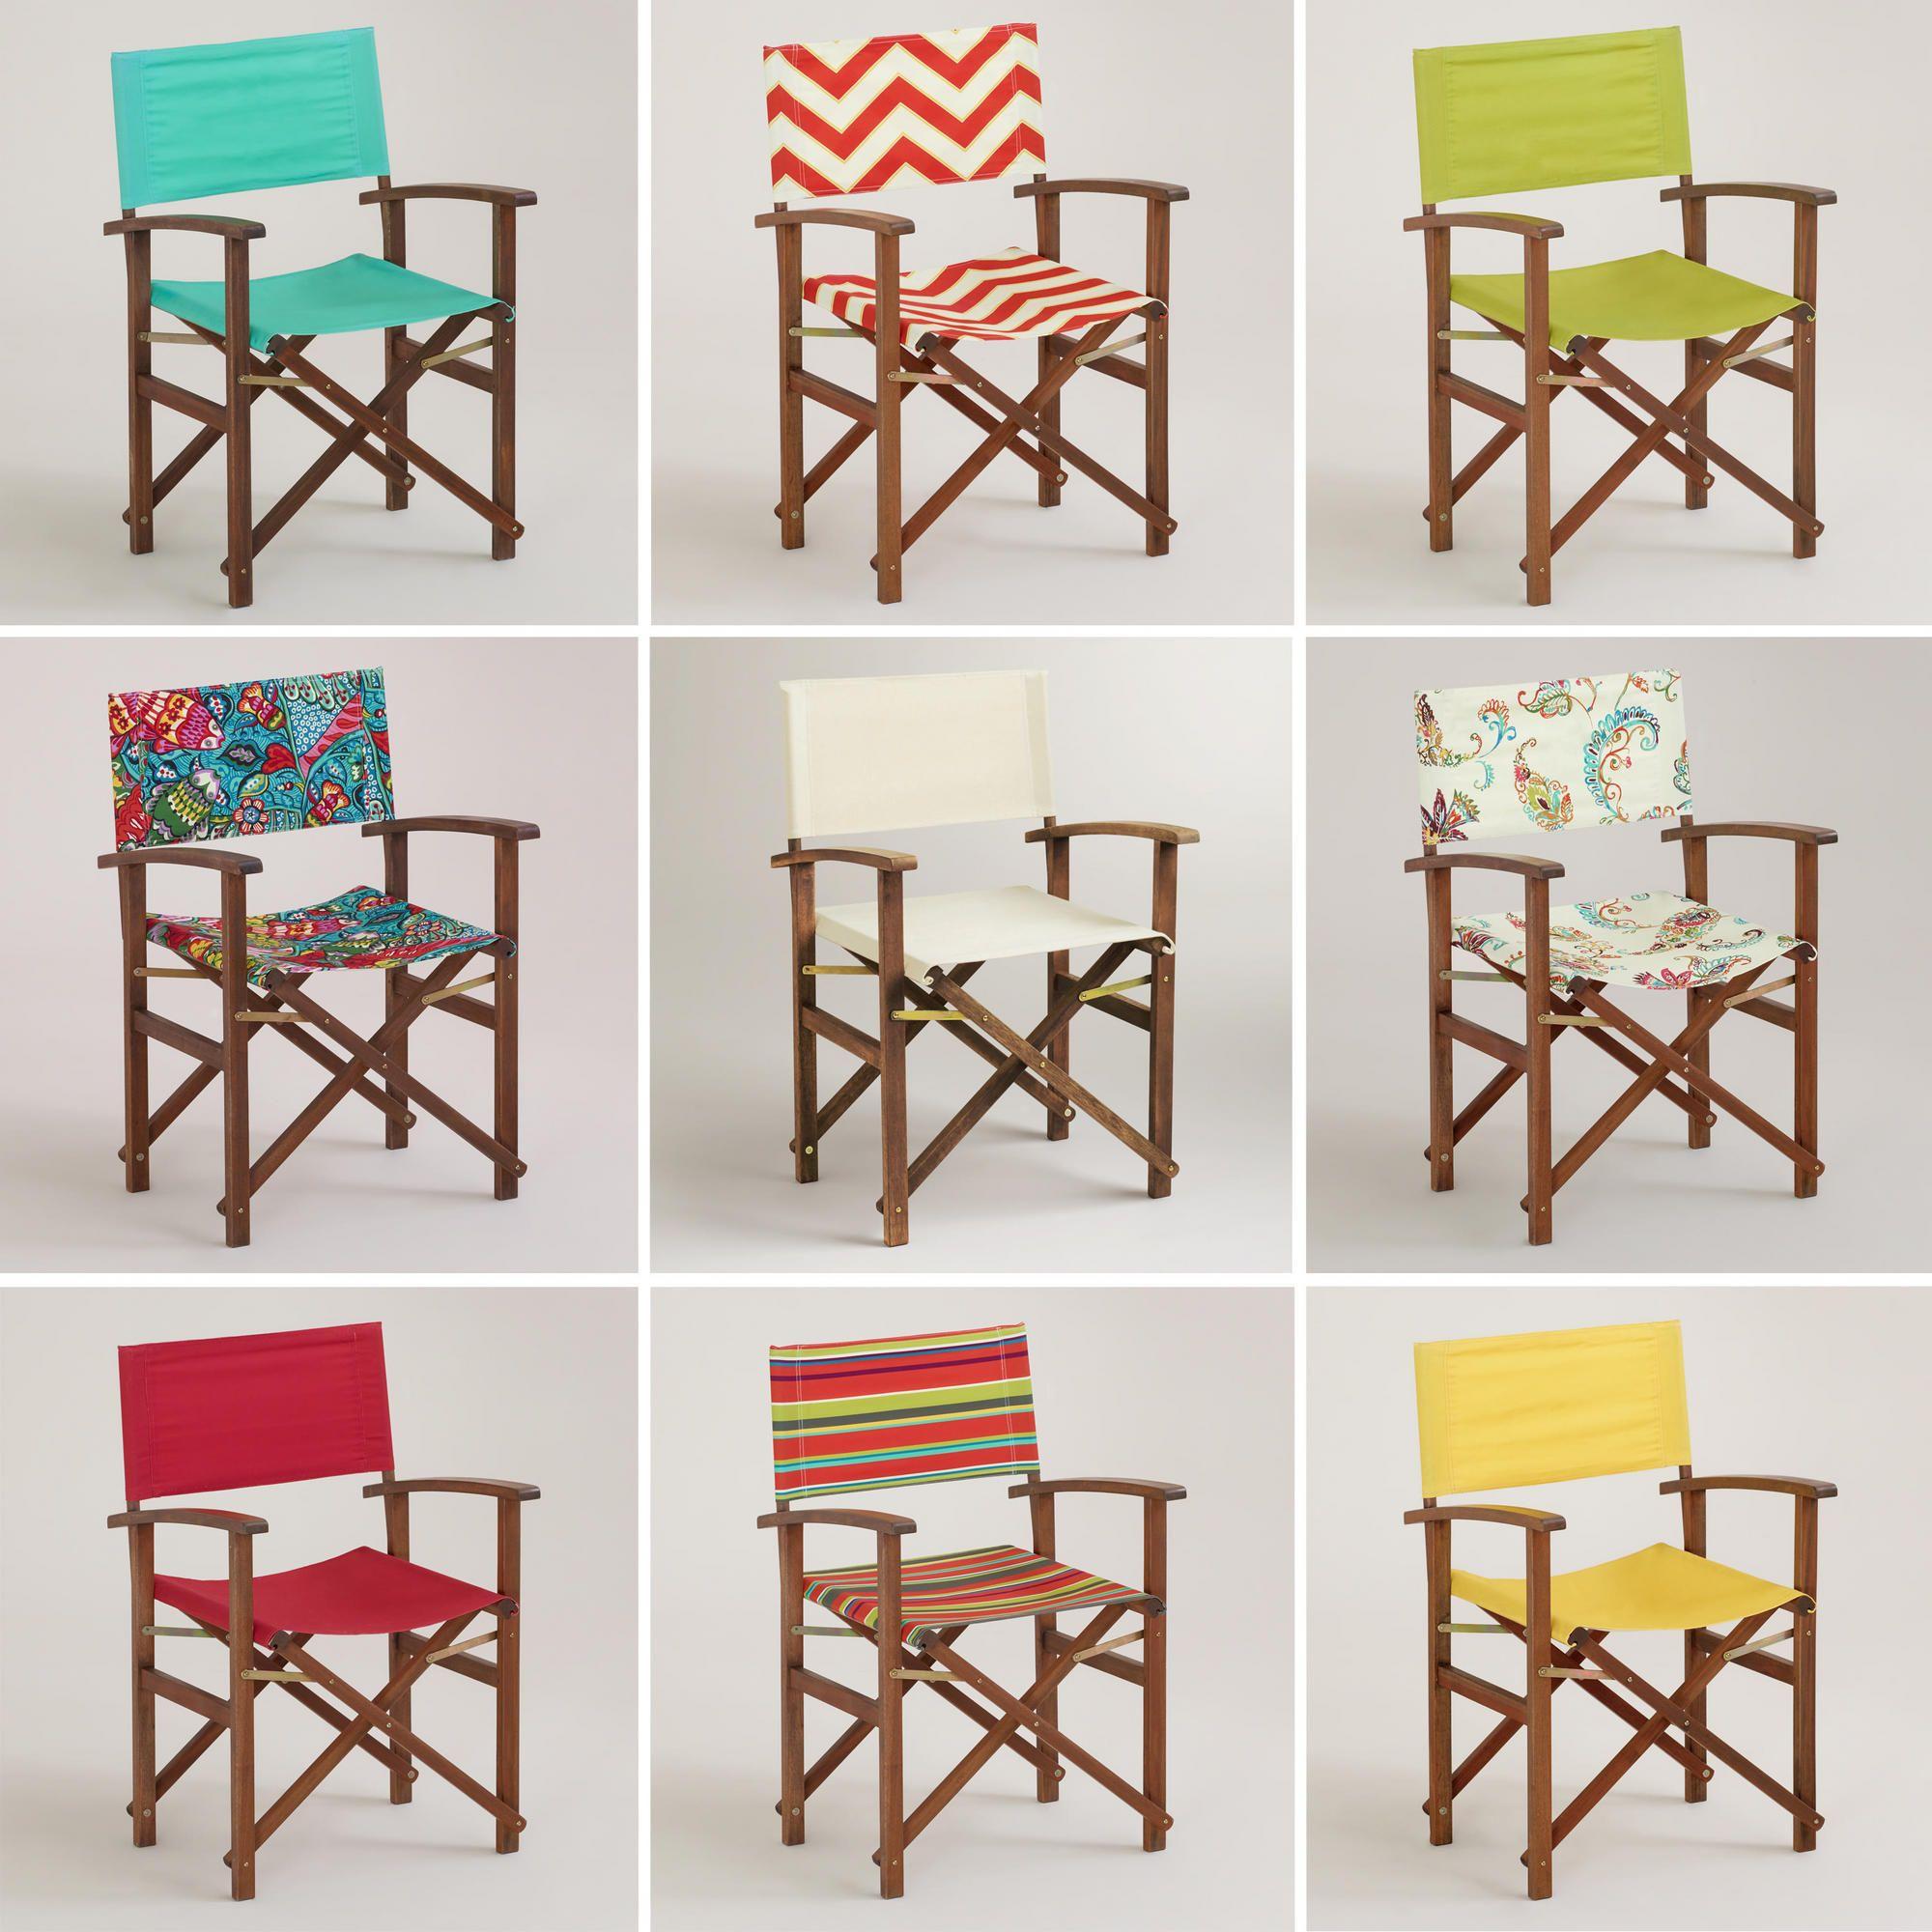 Bali Club Chair Collection Silla Director Sillas Muebles